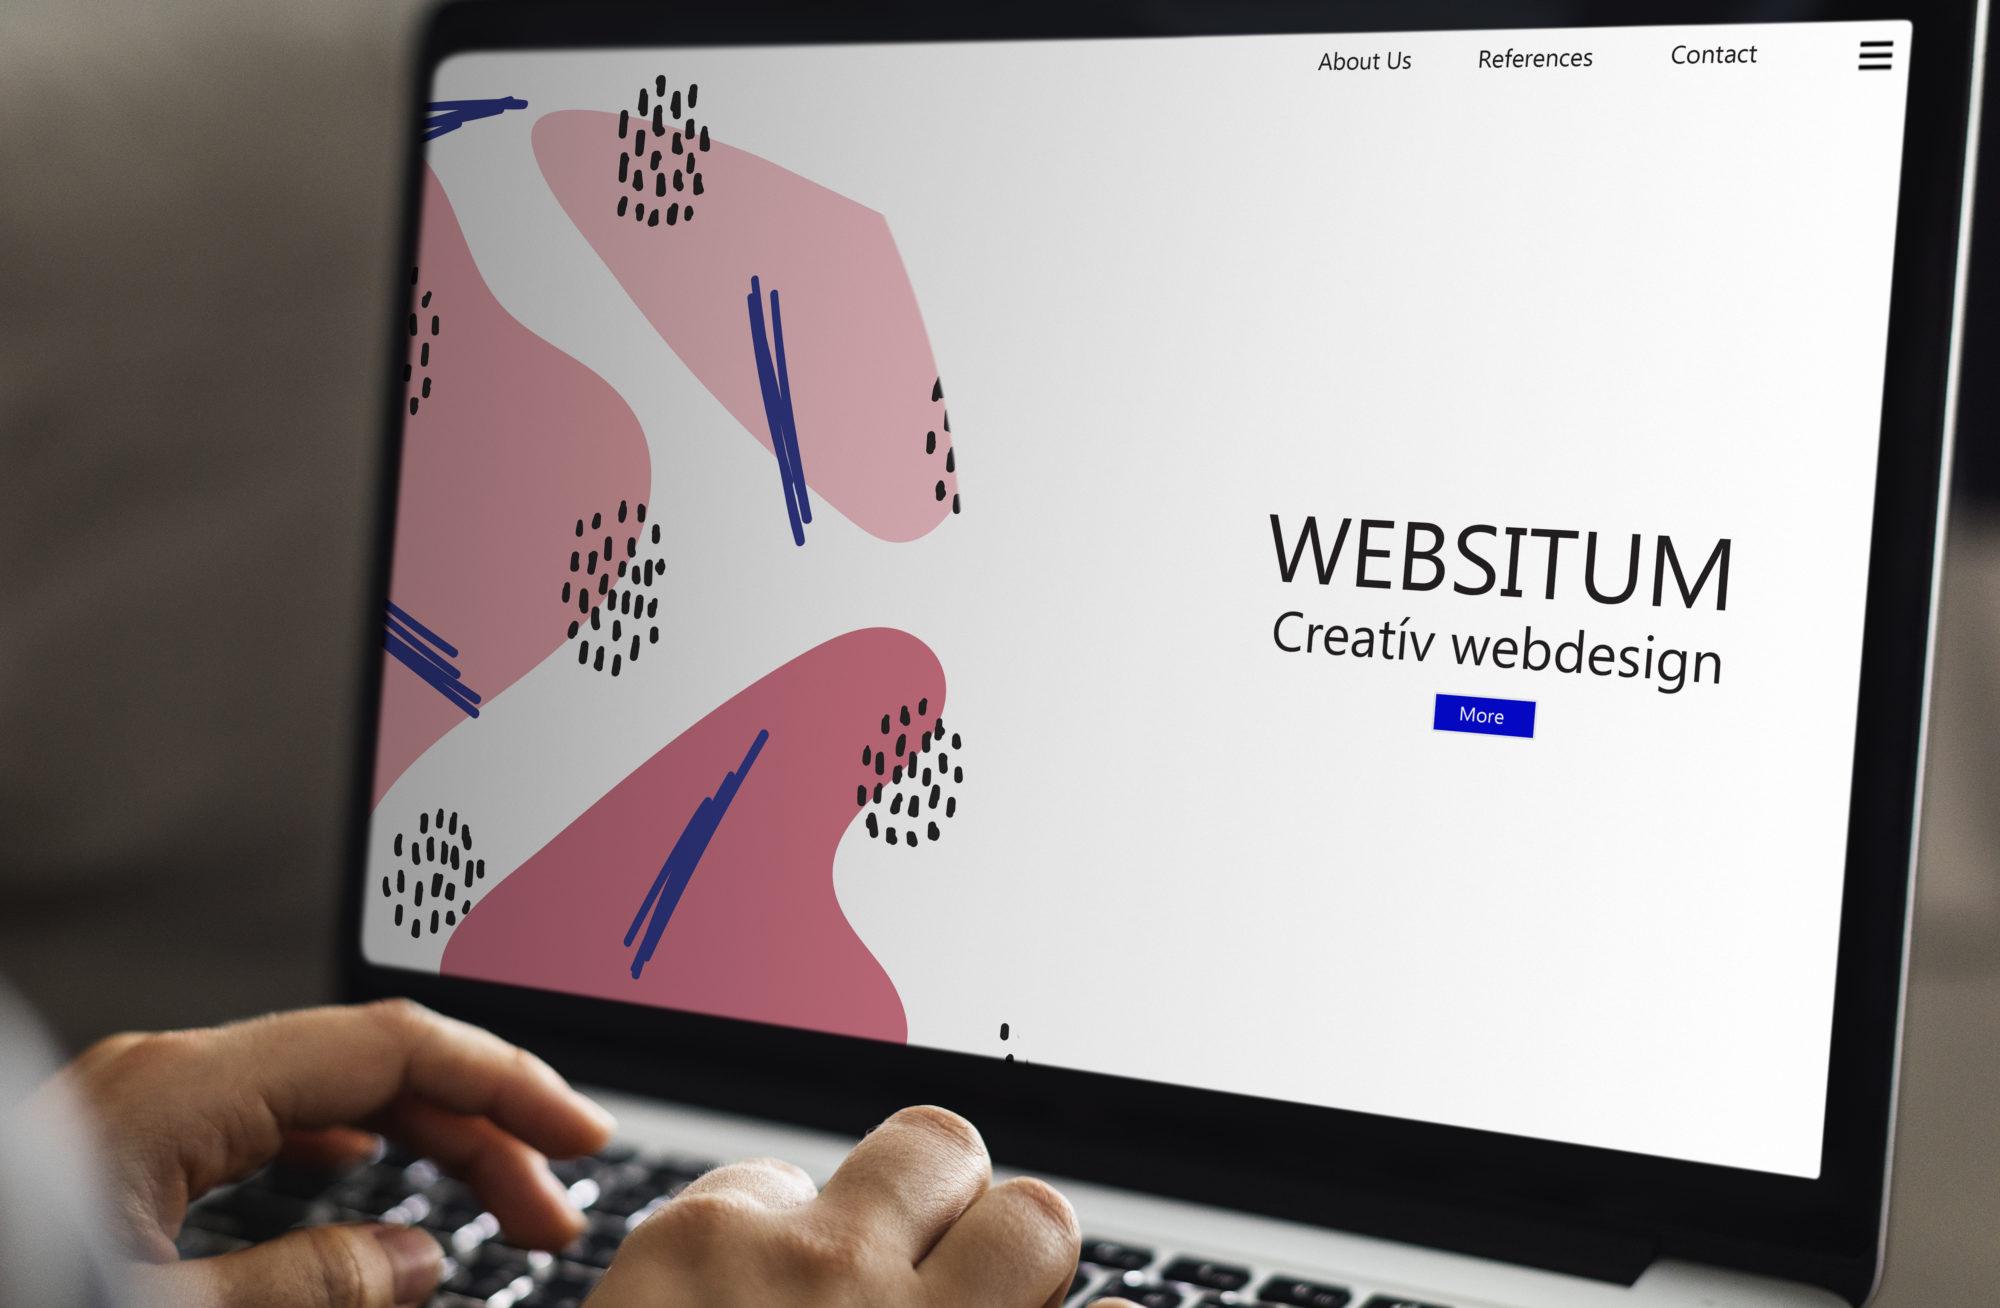 Websitum - Creative webdesign